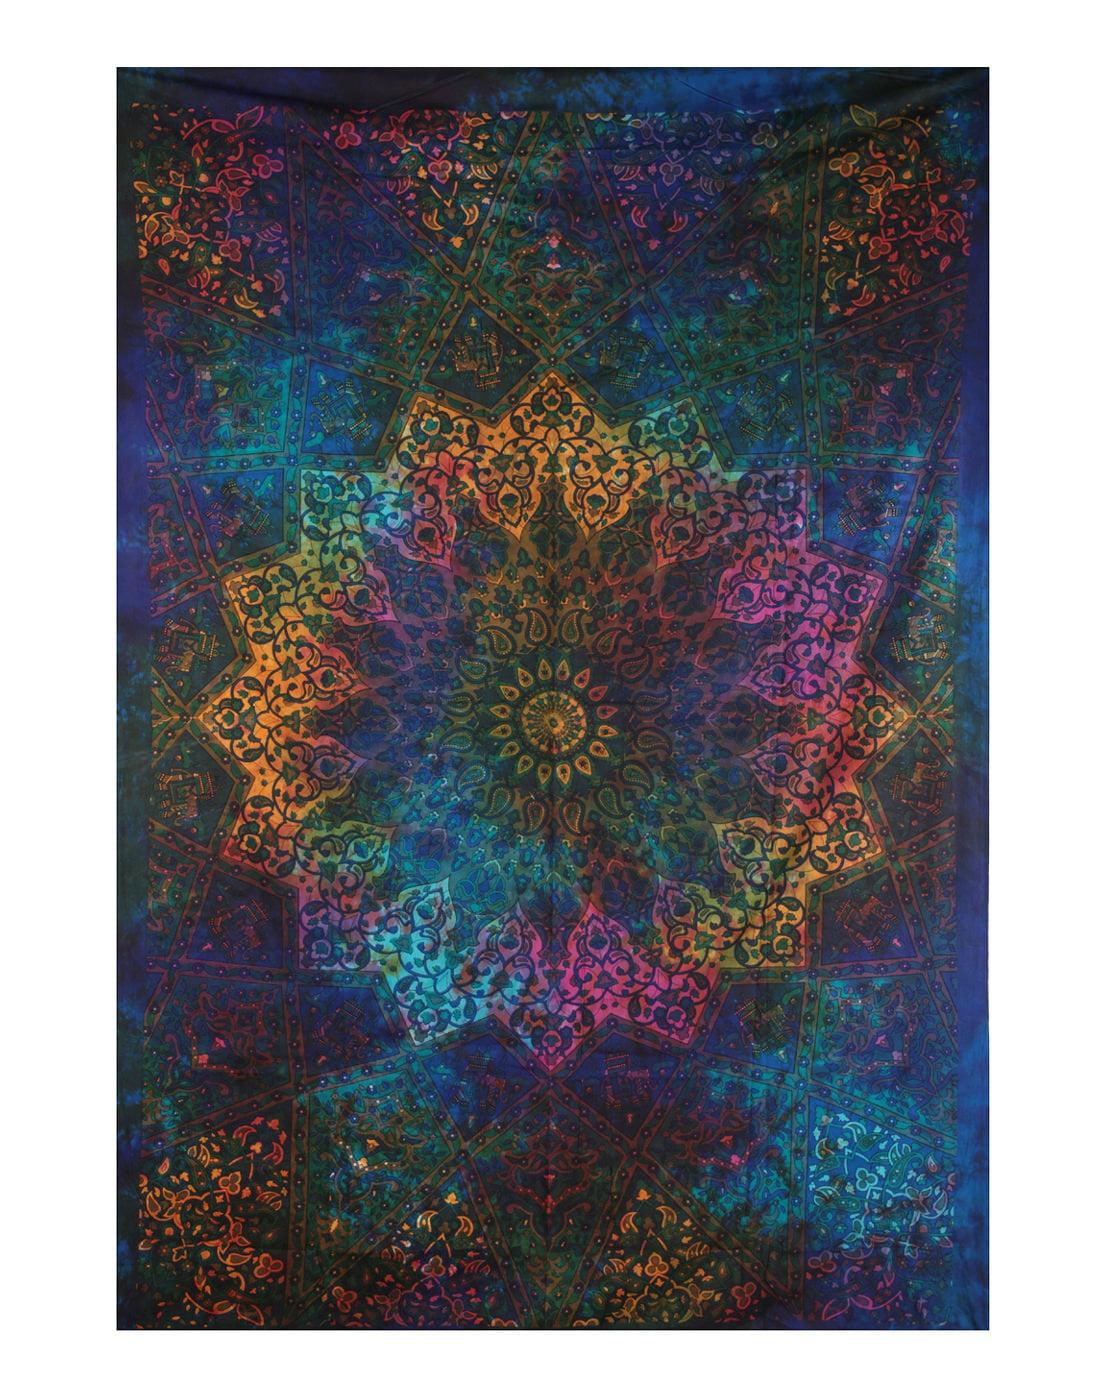 Twin Blue Tie Dye Bohemian Tapestry Hippy Elephant Star Mandala Tapestry Boho Wall Hanging... by Rajrang